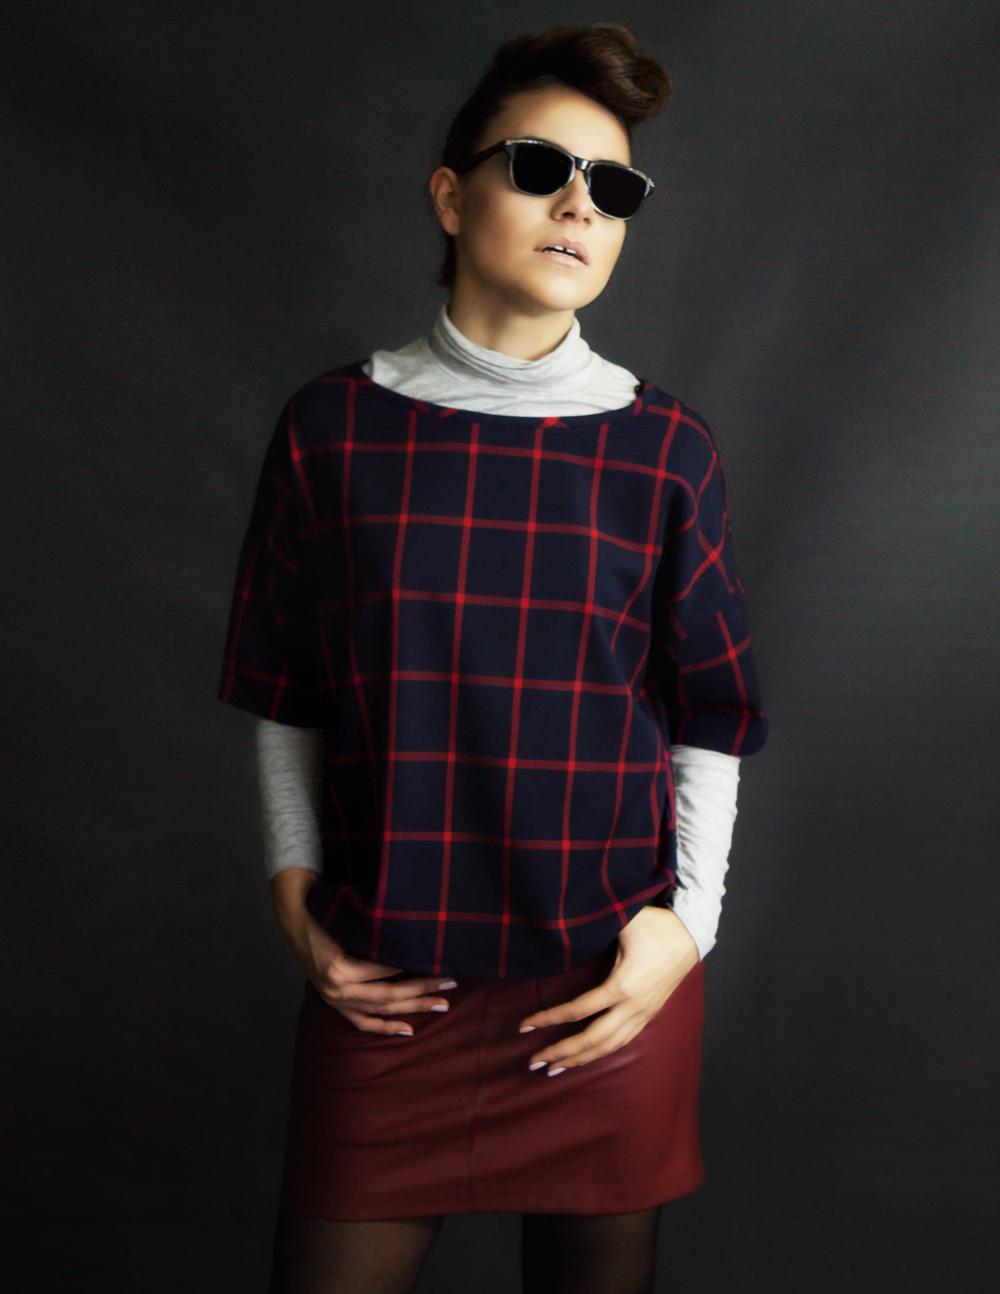 tomboy editorial jose vargas fashion blog moda honduras estilo revista noe pantano fashion blog blogger street style olga mossi